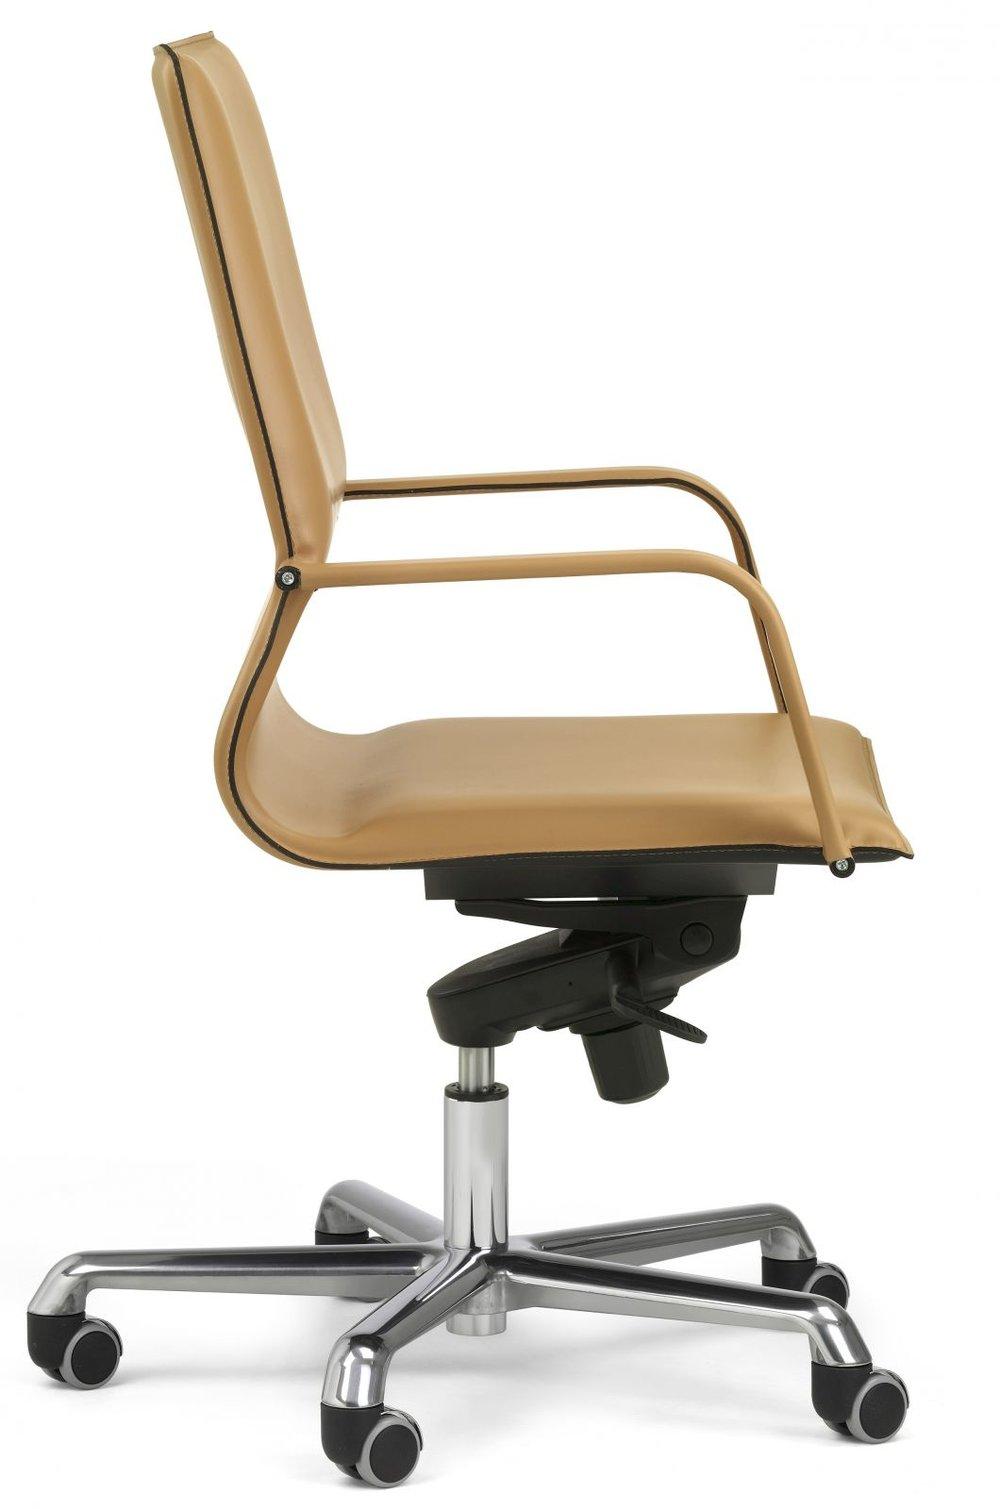 modern-office-chairs-Italian-furniture-designer-chairs (42).jpg